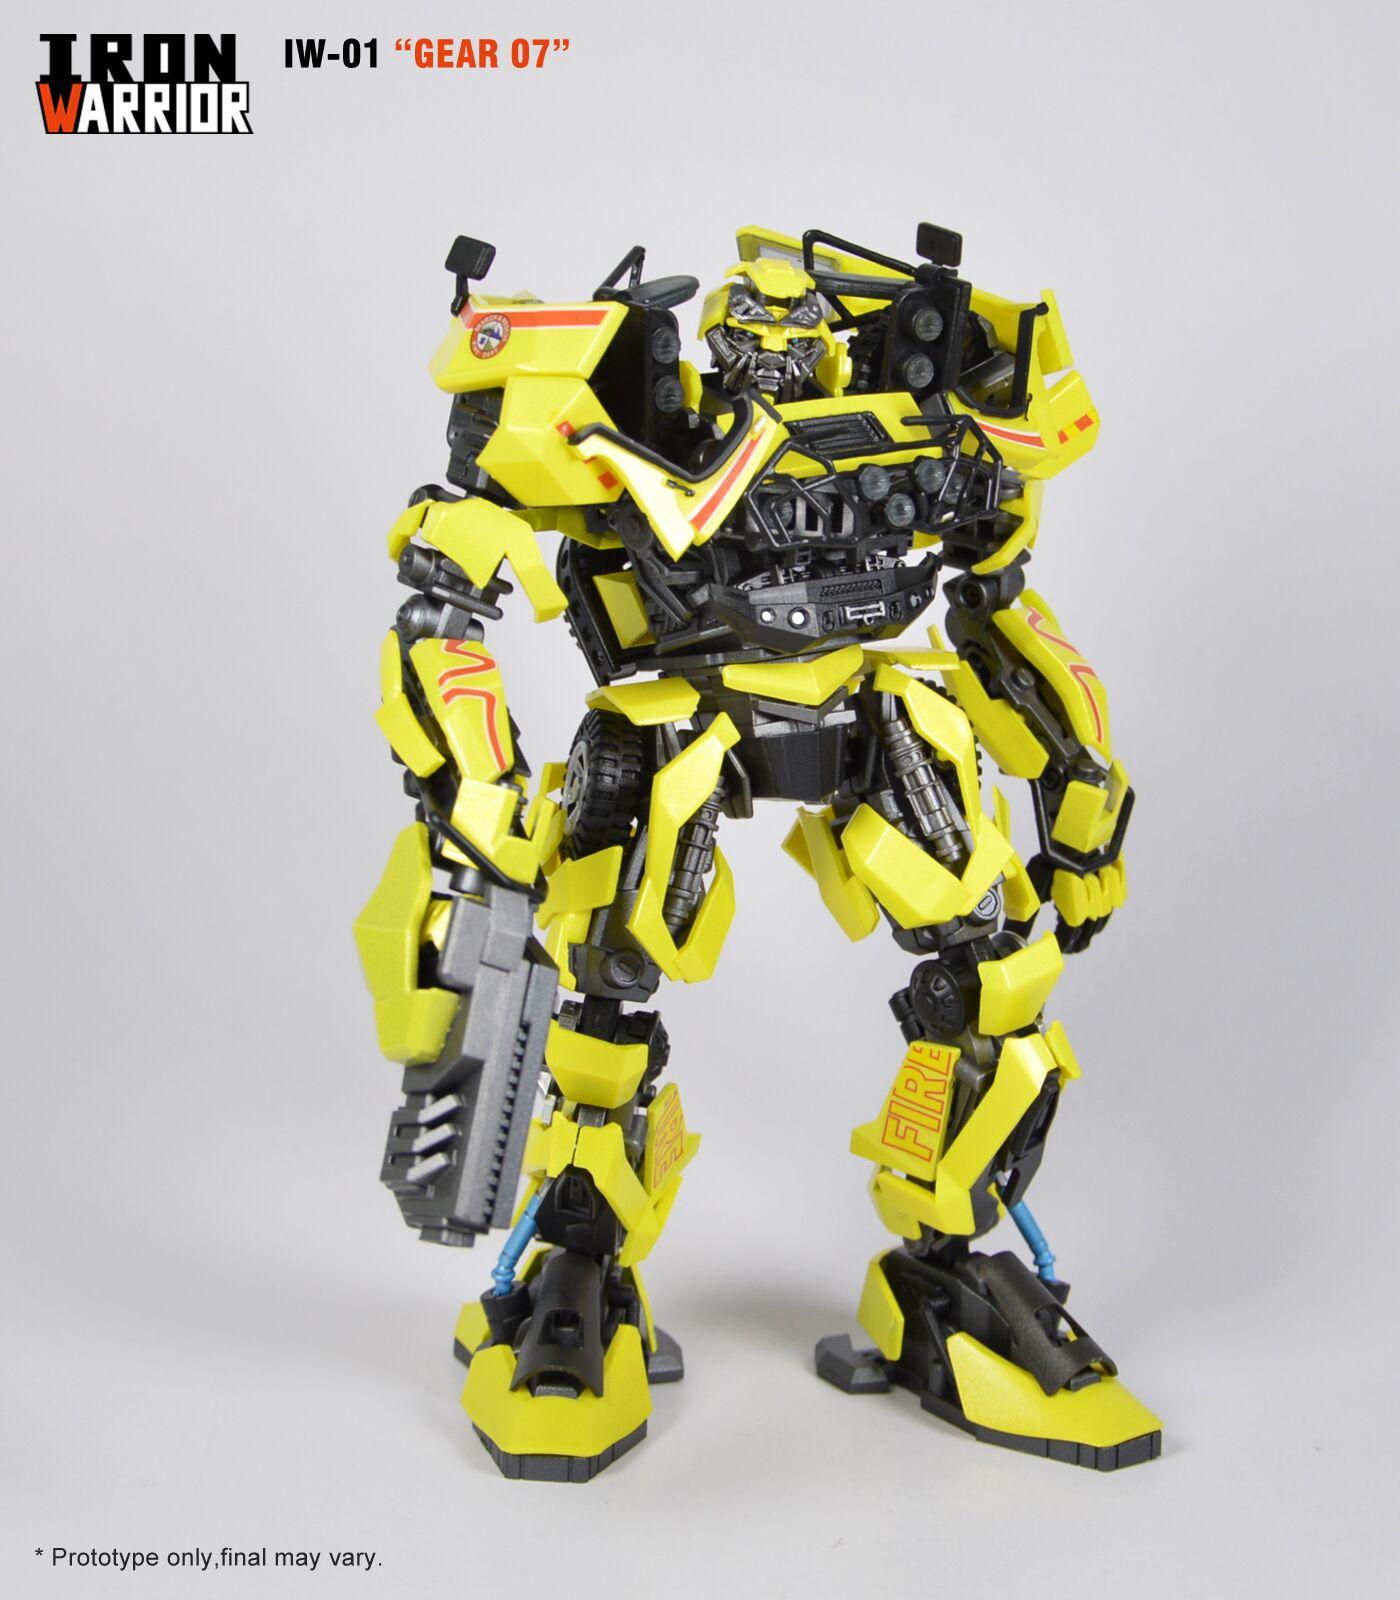 Iron Warrior Iw 01 Dmk Gear 07 Preorder X2otoys Malaysia